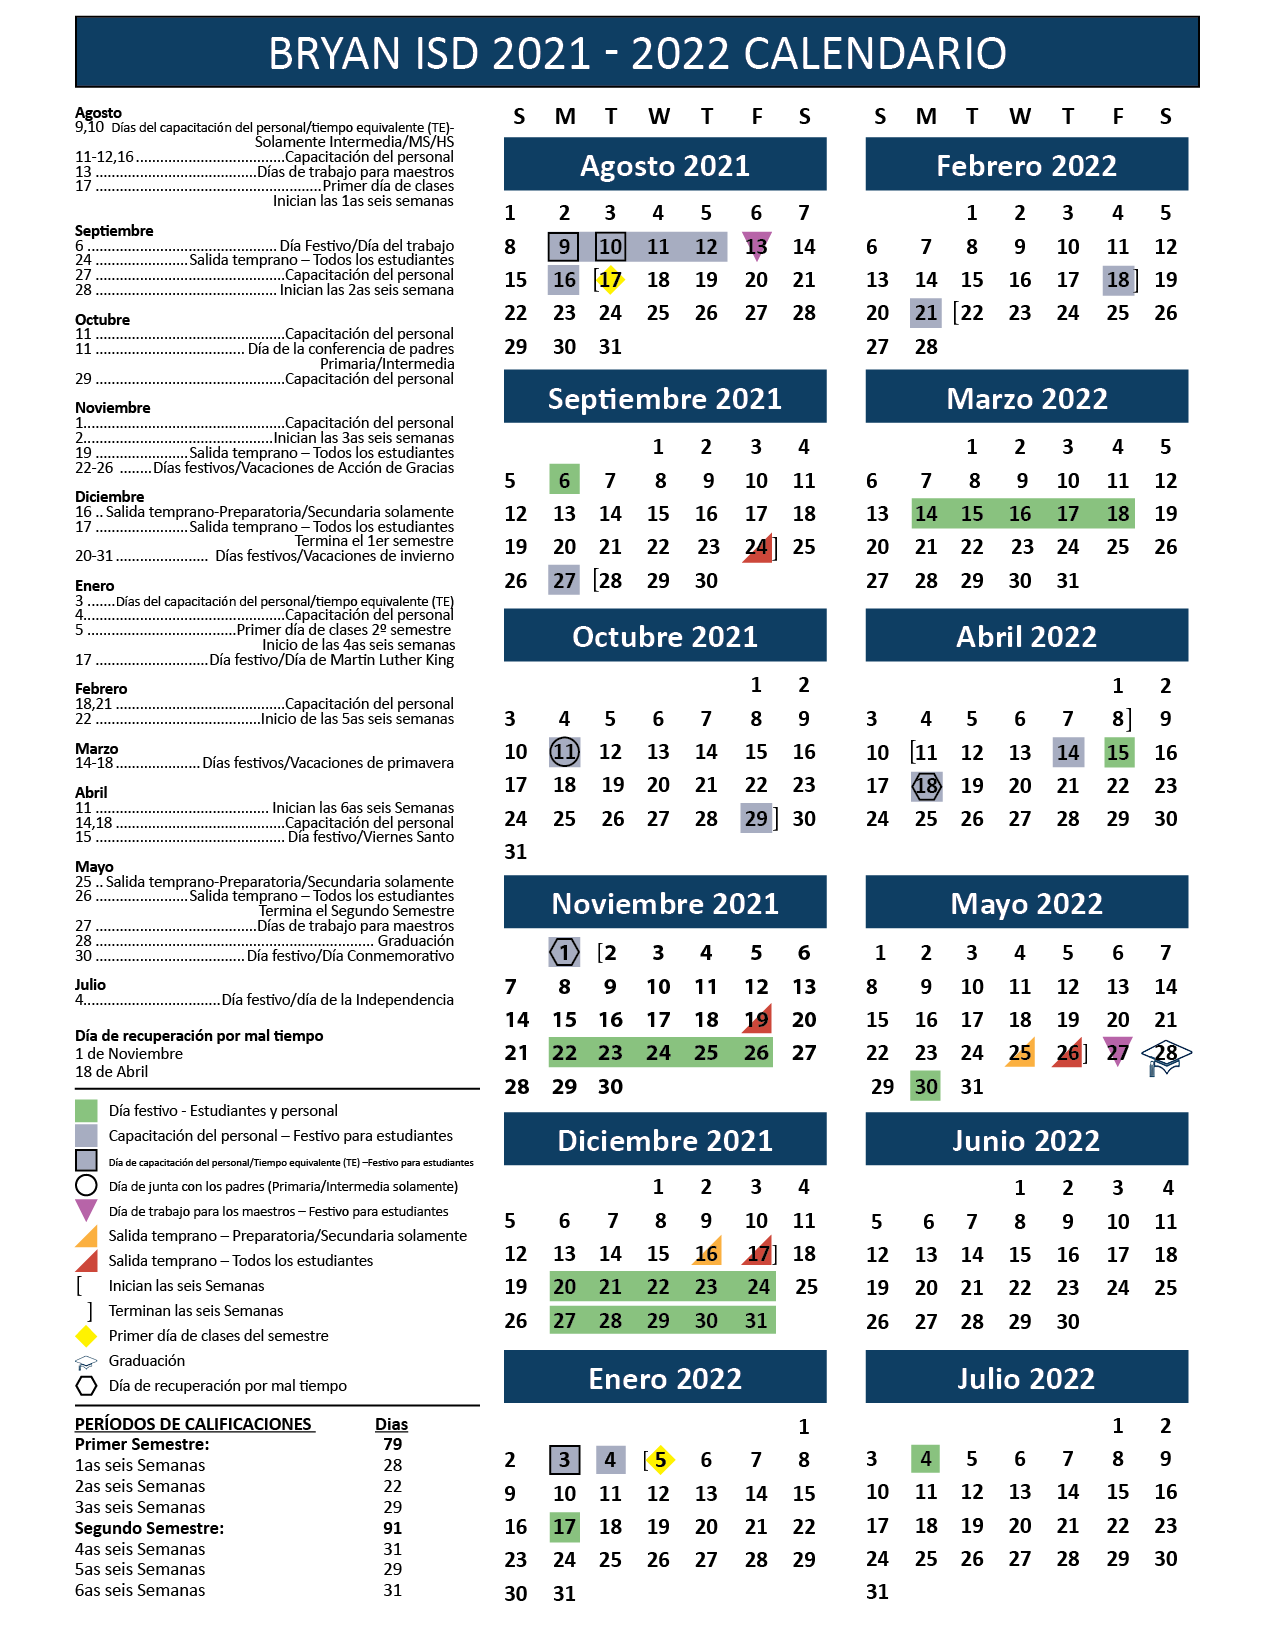 Bisd Calendar 2022 2023.Bryan Independent School District